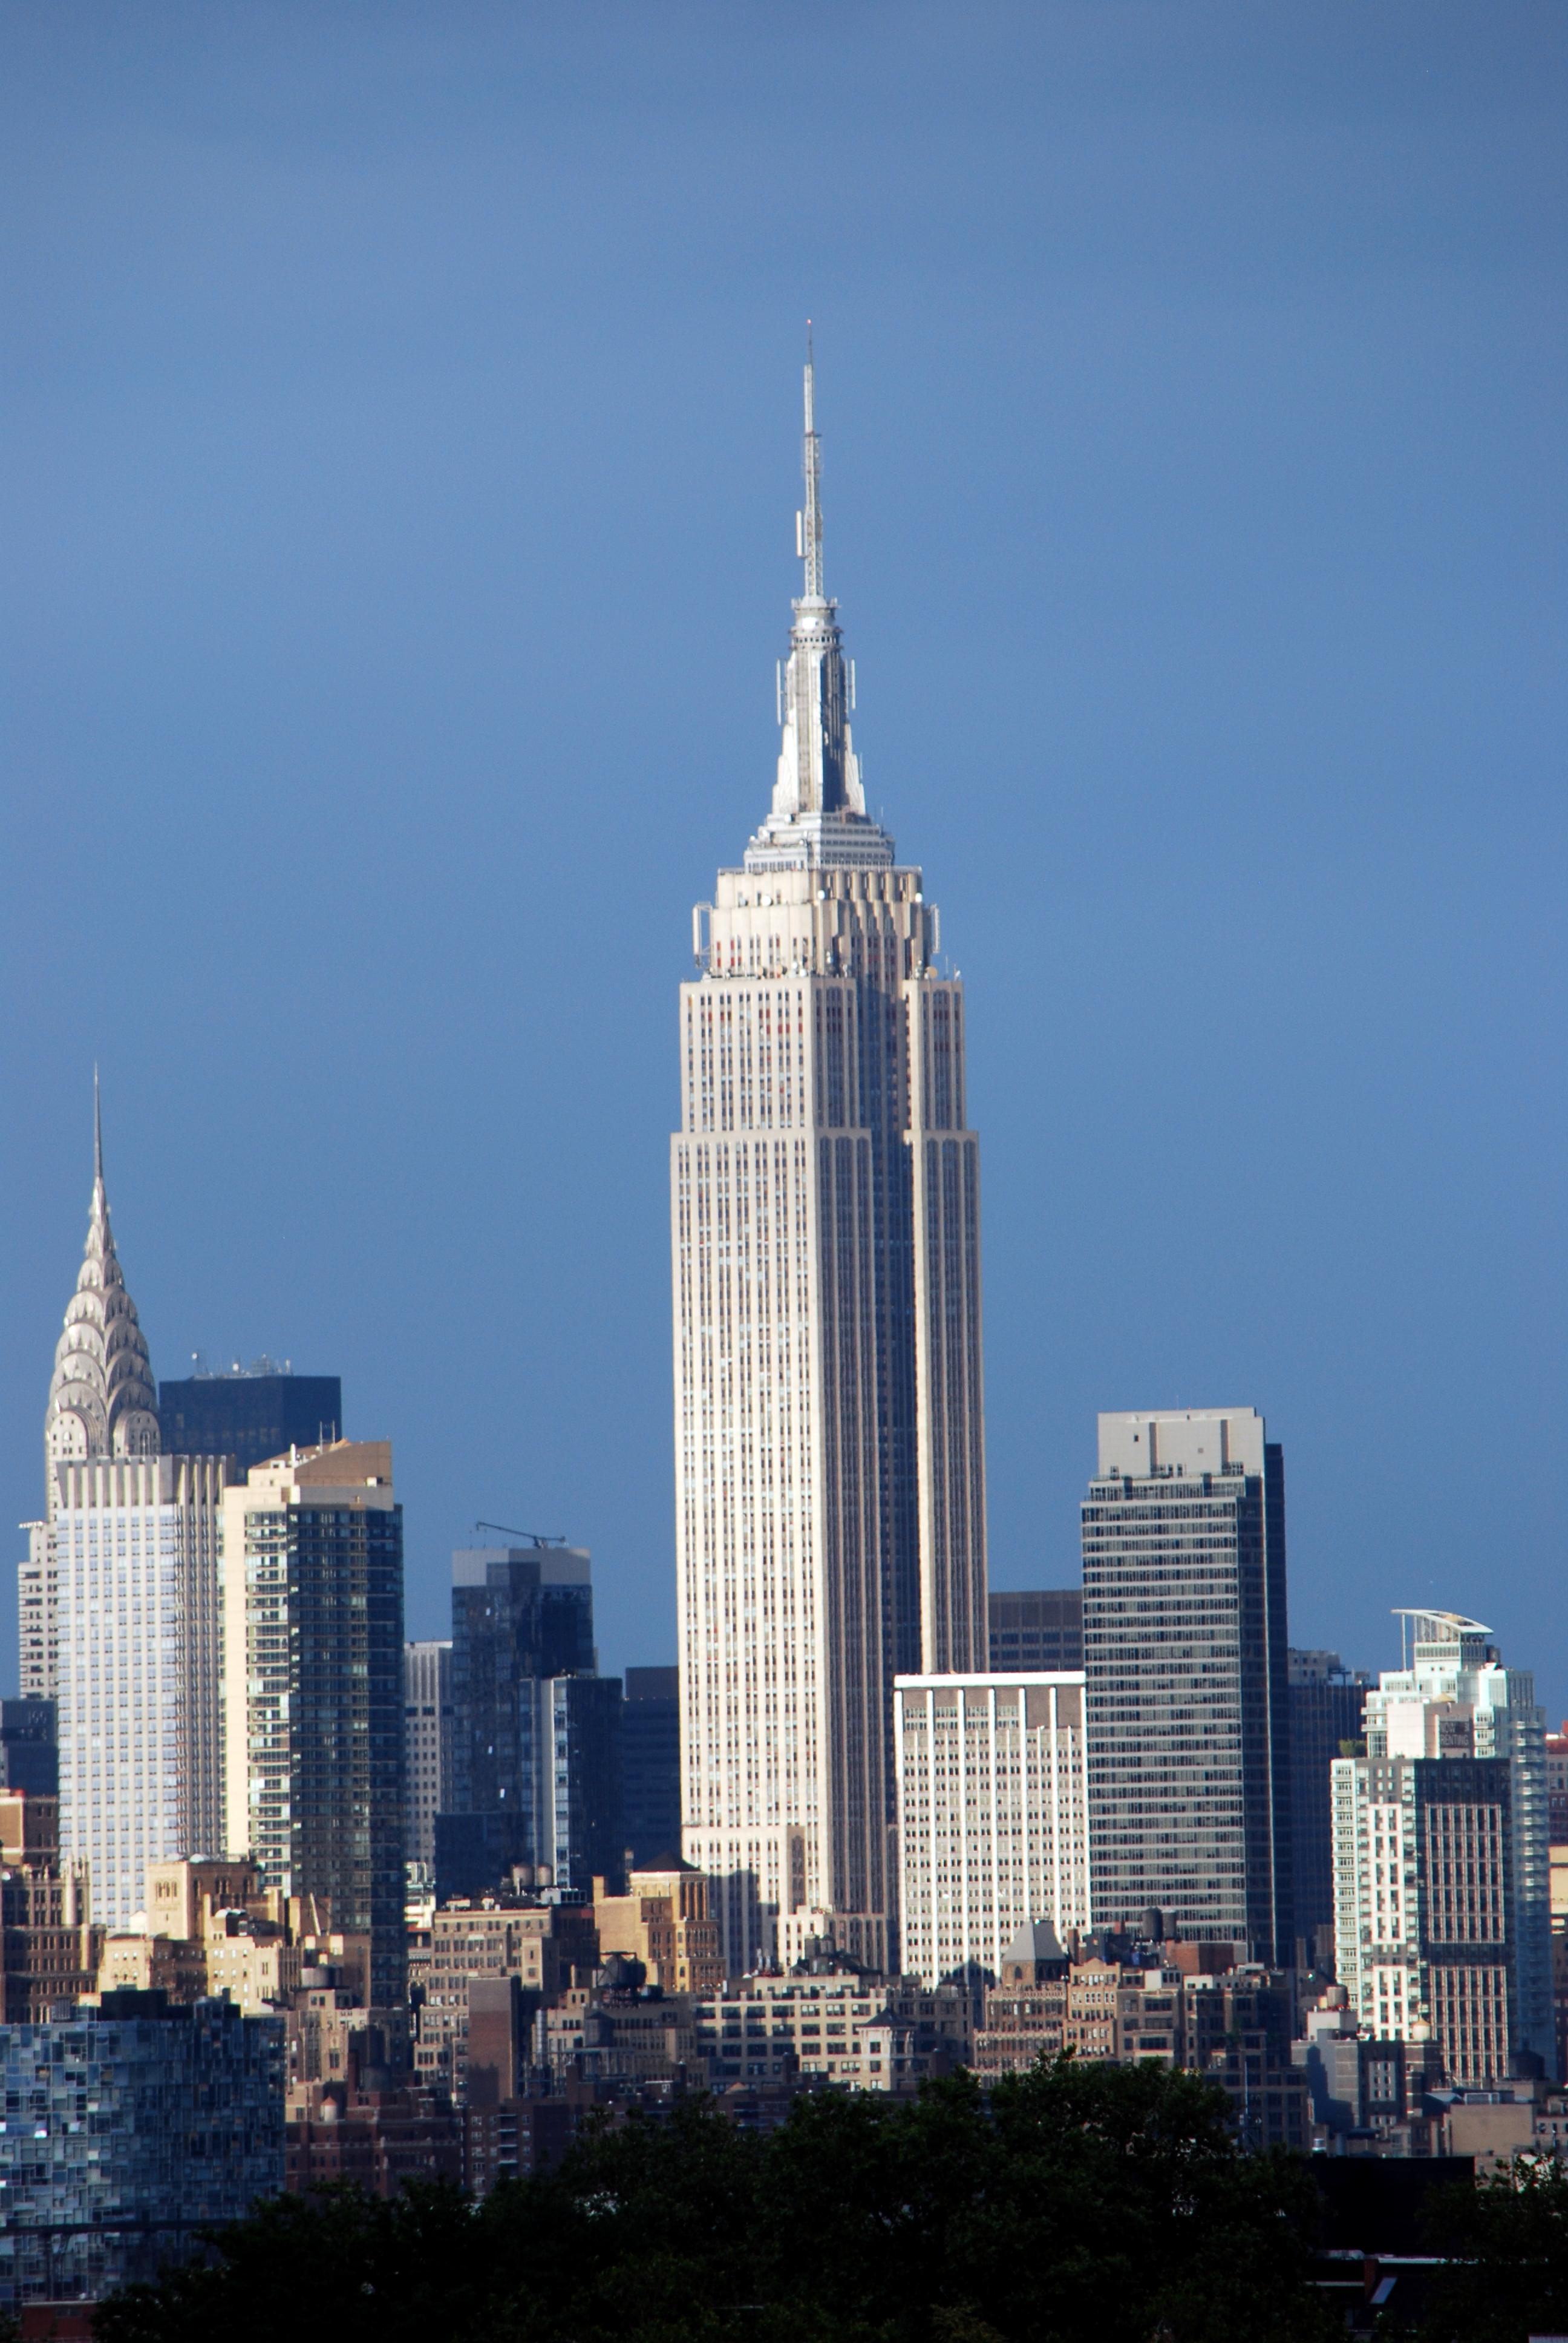 The Empire State Building Pop Up Maegan Buraer